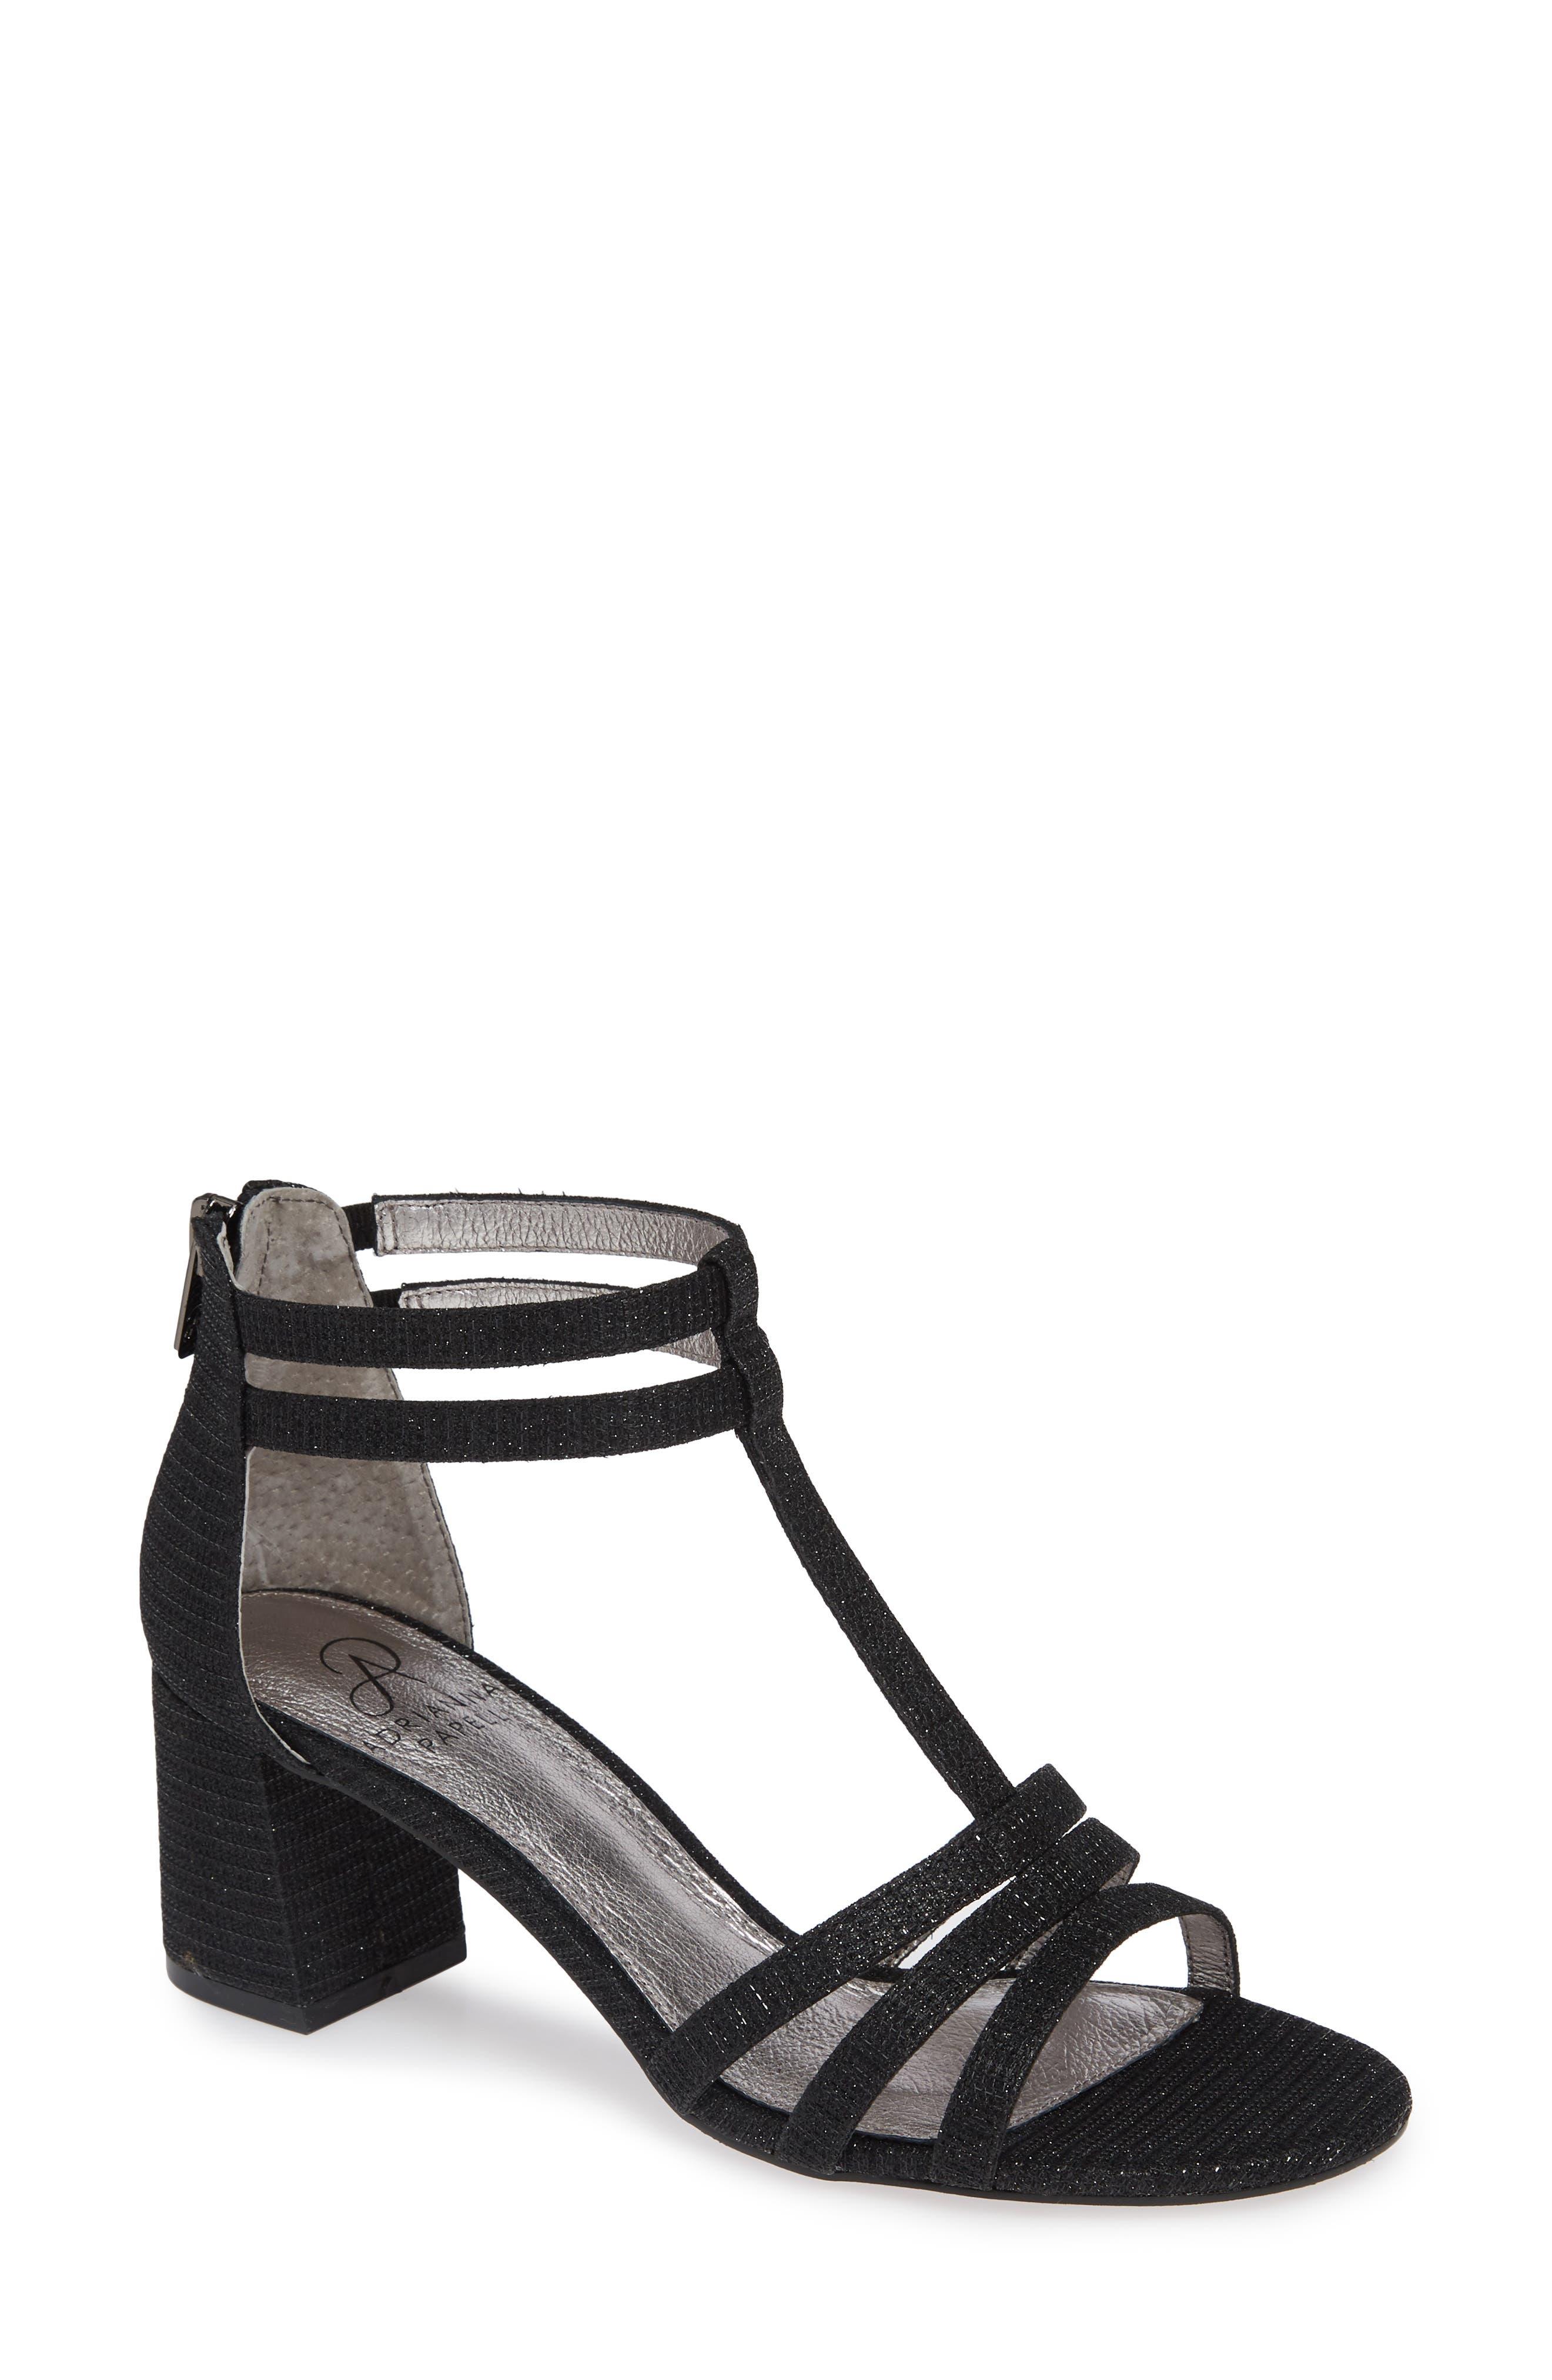 Anella Block Heel Sandal,                             Main thumbnail 1, color,                             BLACK GLITTER